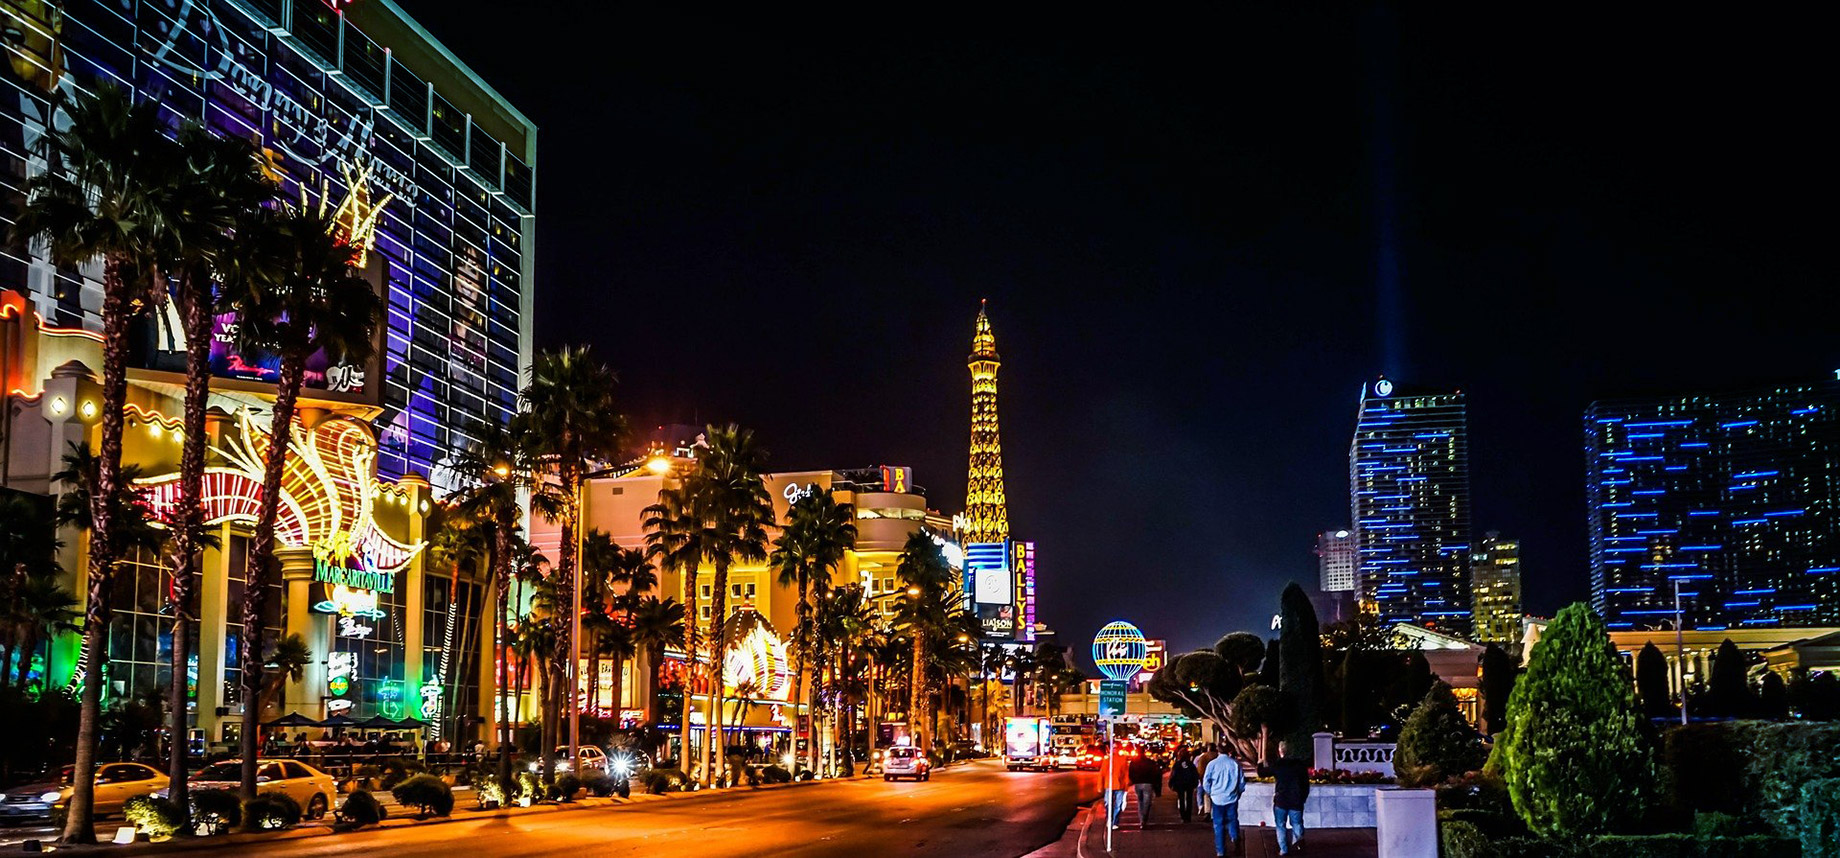 Purchasing or Renting Property - Las Vegas, Nevada, USA